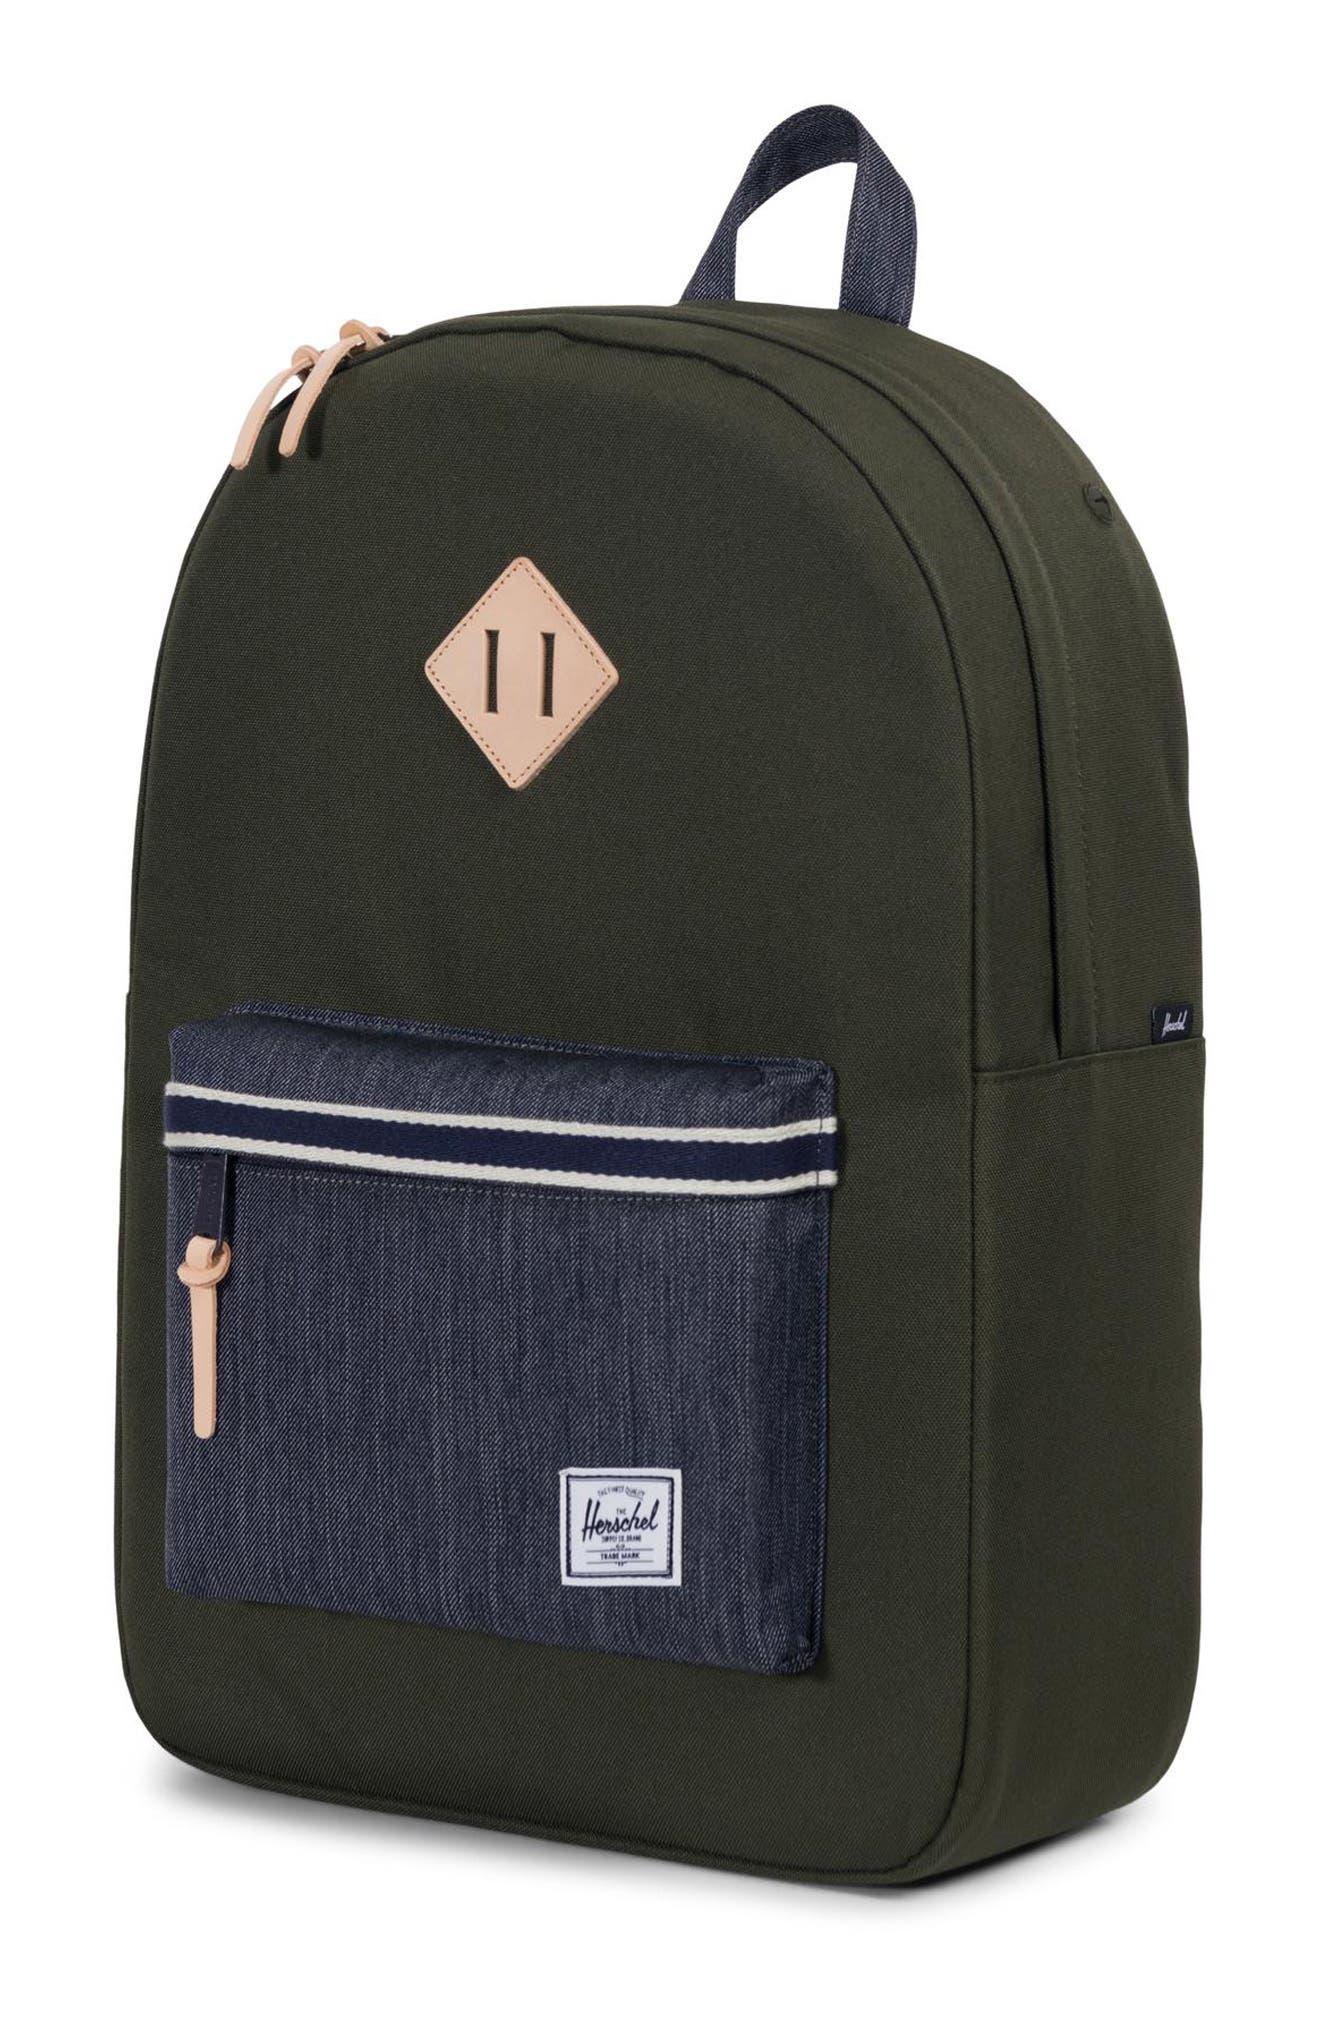 Heritage Offset Denim Backpack,                             Alternate thumbnail 4, color,                             FOREST NIGHT/ DARK DENIM